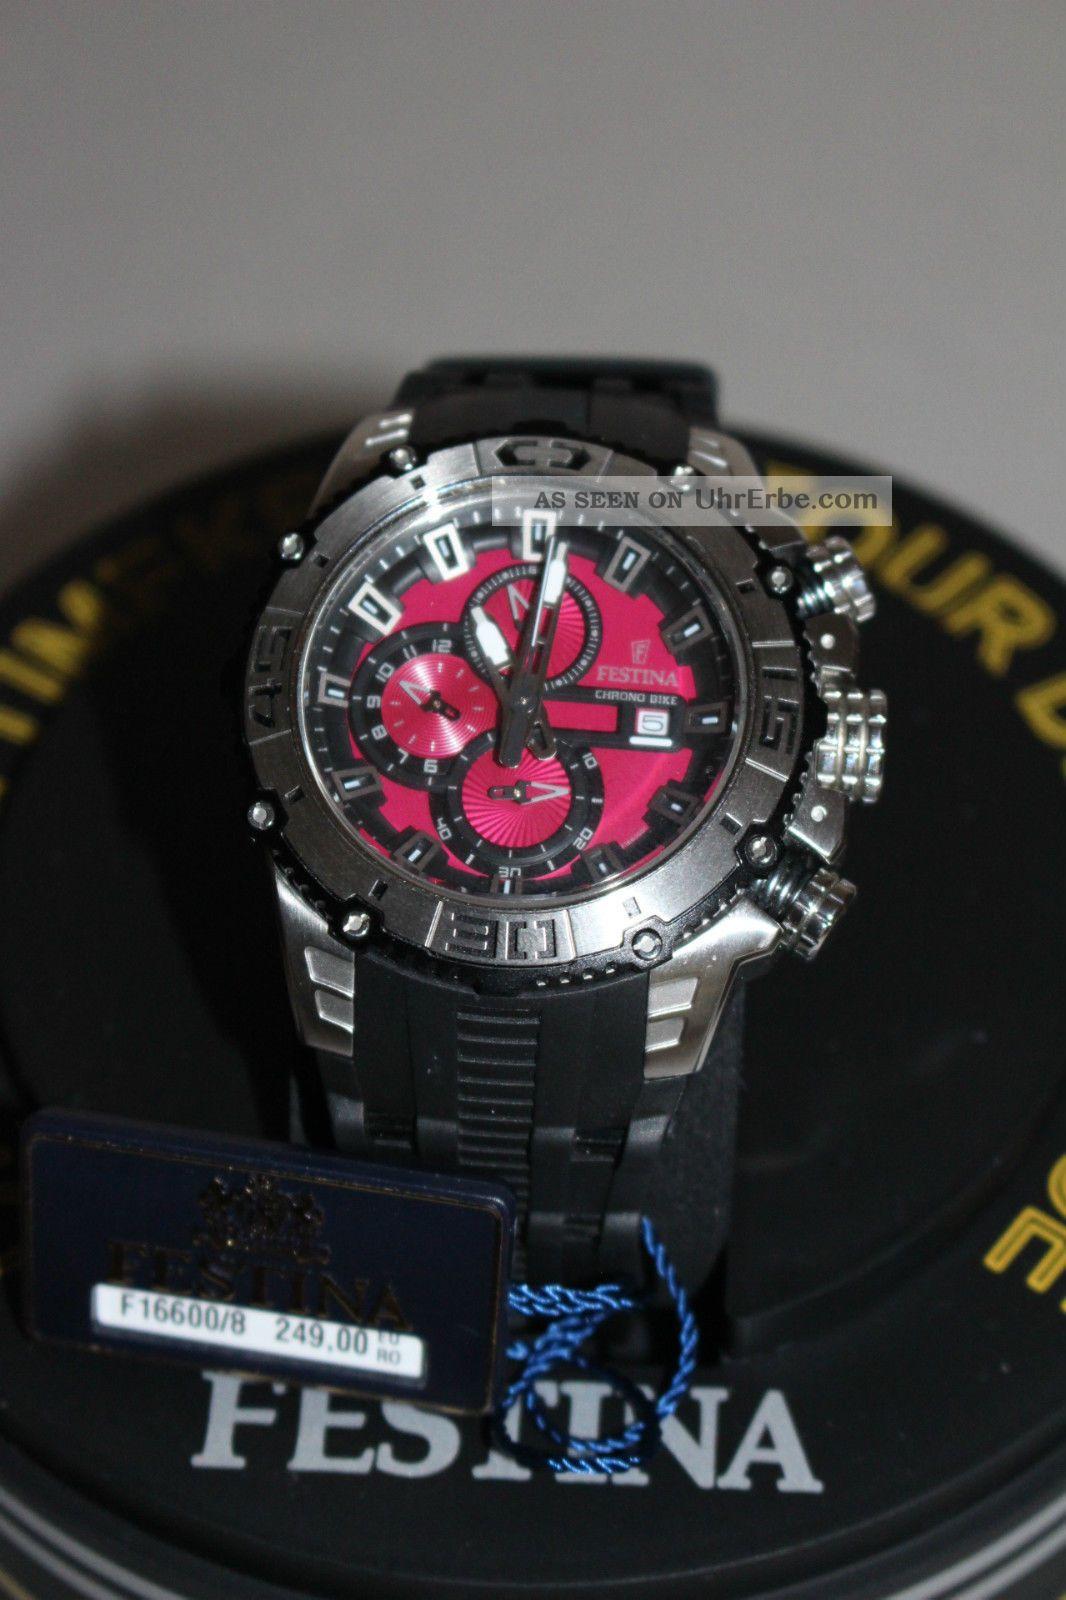 Festina Sport Chrono Bike Armbanduhr Für Herren (f16600/8) Top Uhr Armbanduhren Bild